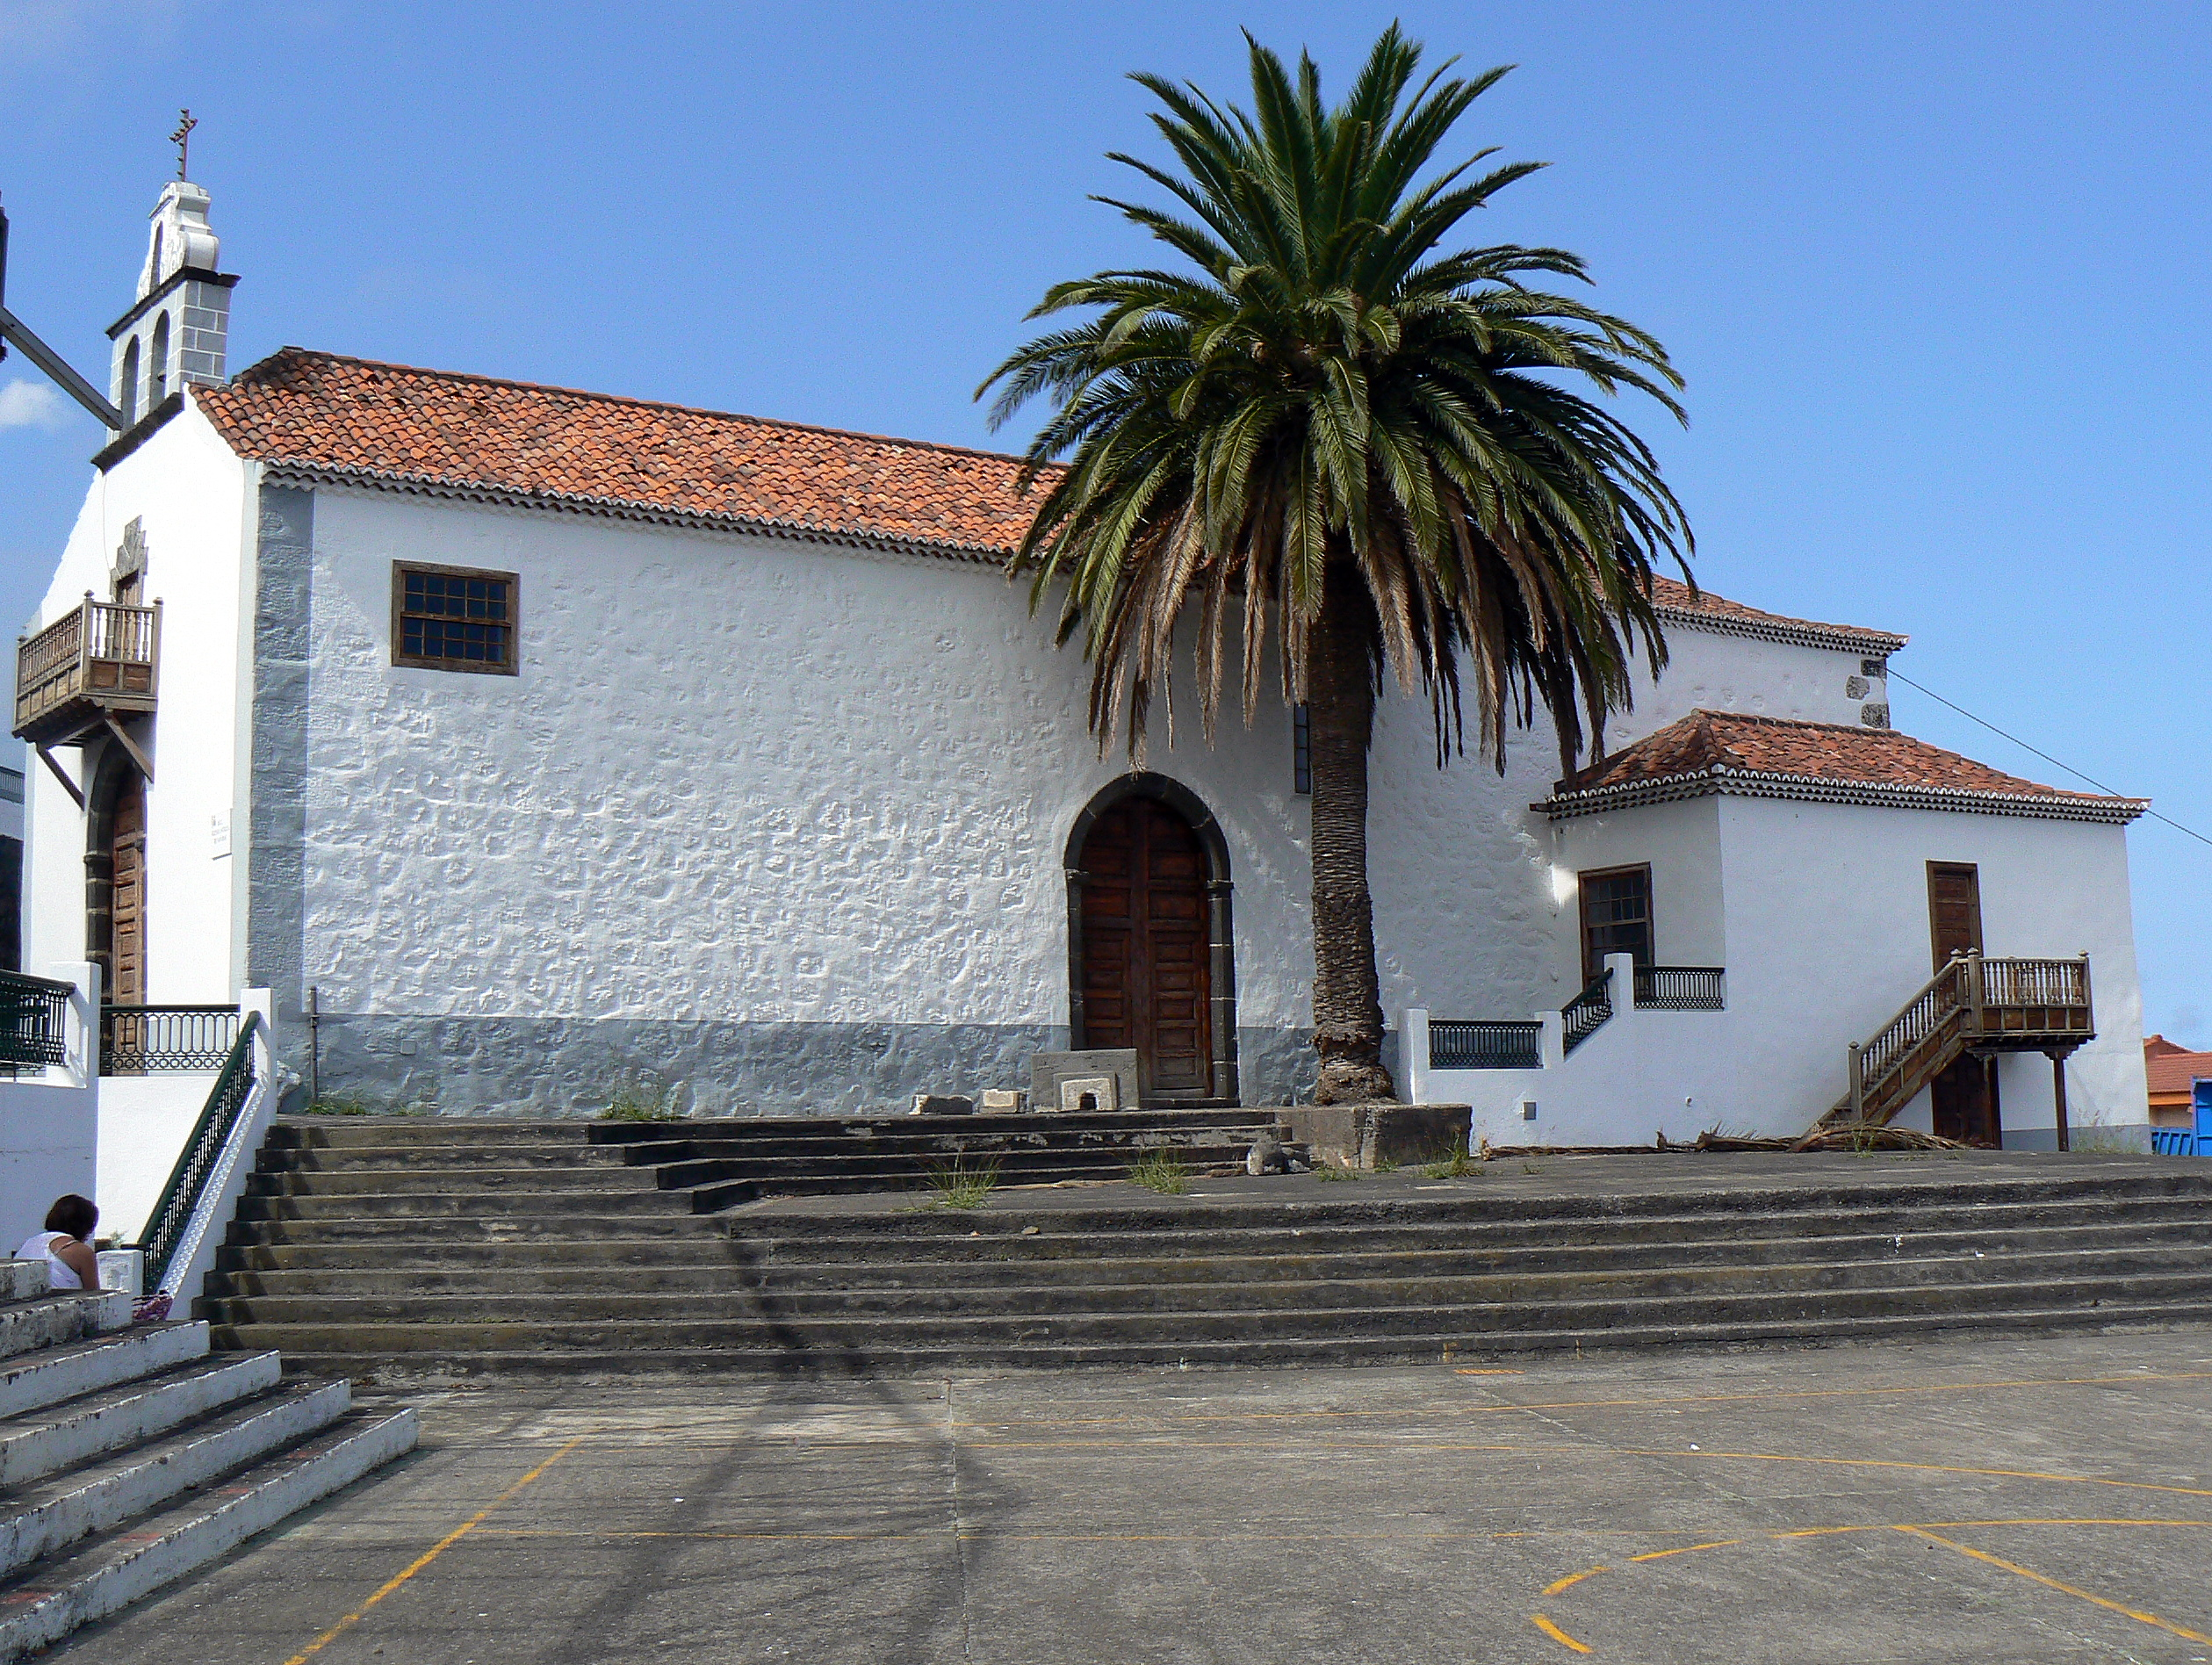 http://upload.wikimedia.org/wikipedia/commons/d/d3/Lado_derecho_Iglesia_de_San_Jos%C3%A9_Bre%C3%B1a_Baja-1.jpg